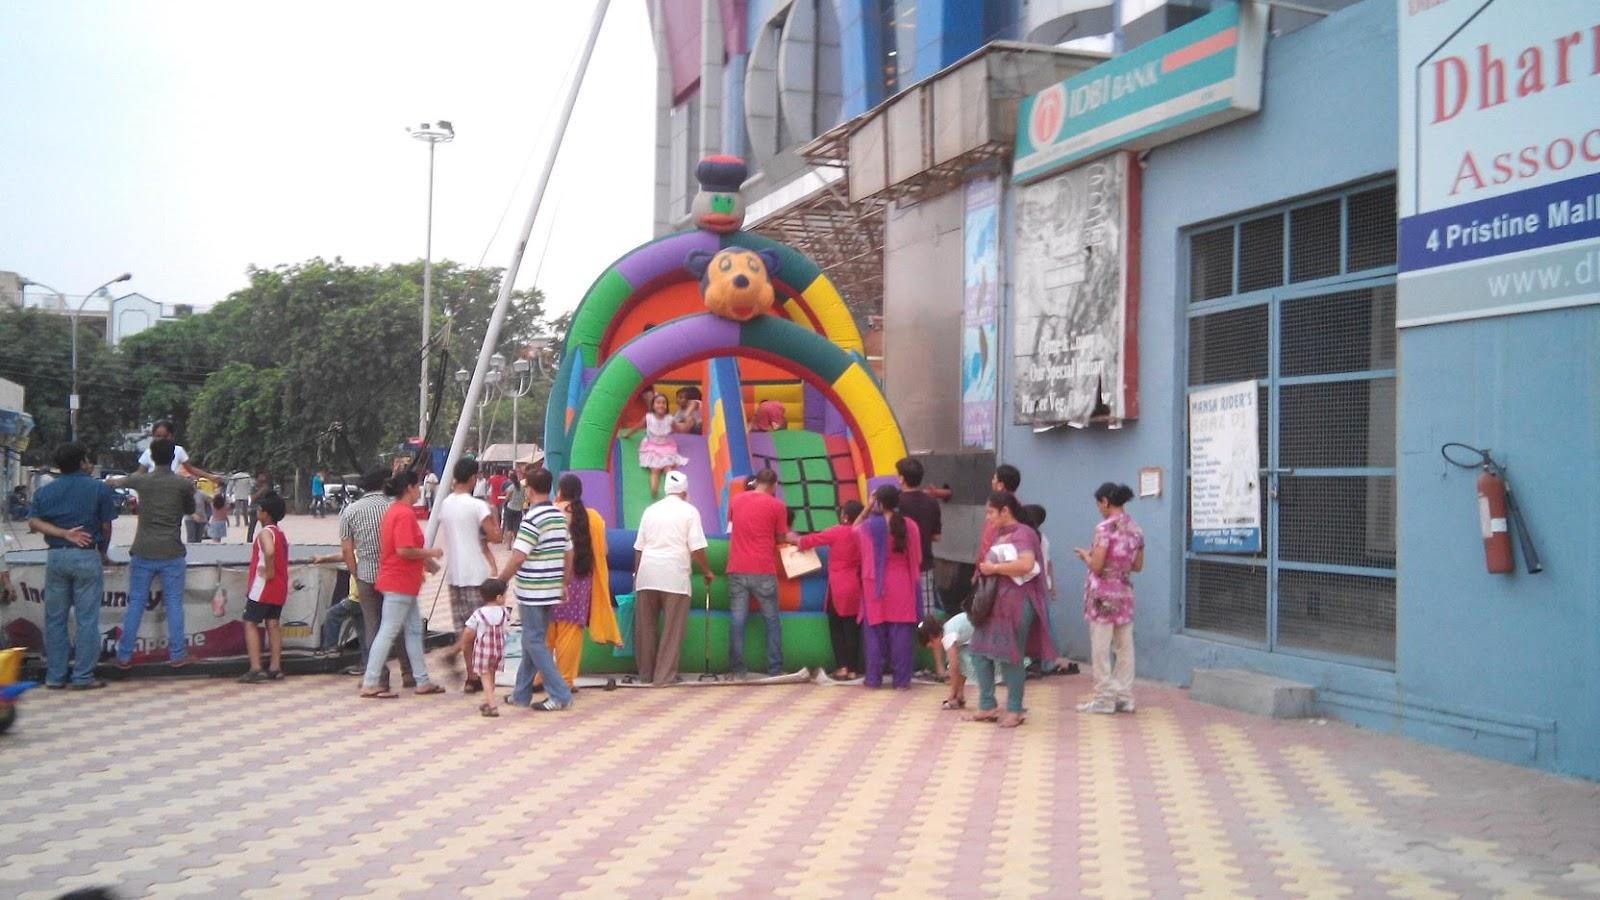 SRS Cinemas (Pristine Mall)